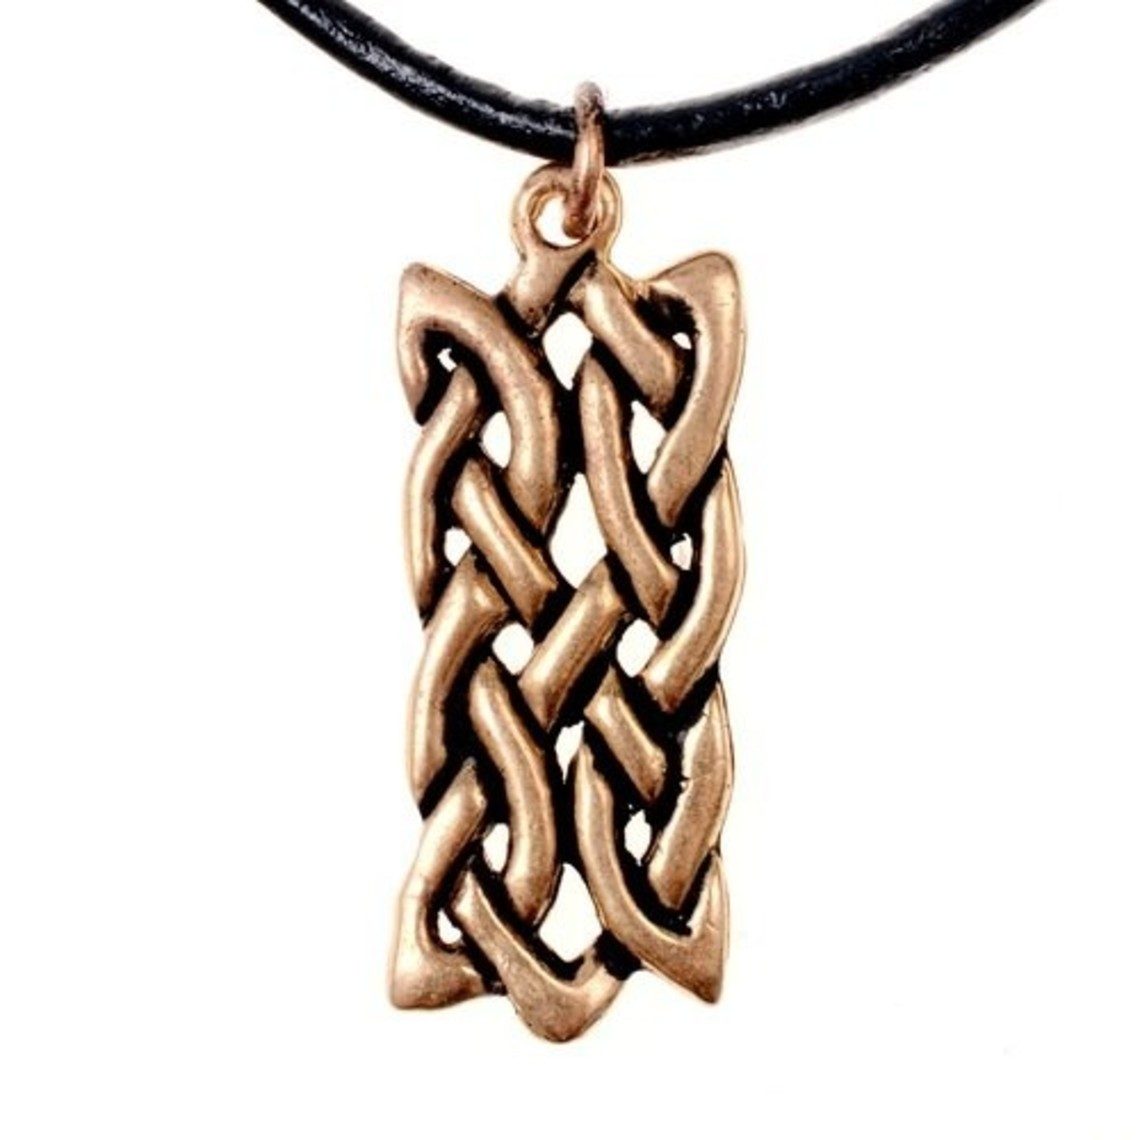 Pendentif motif rectangulaire noeud celtique, bronze